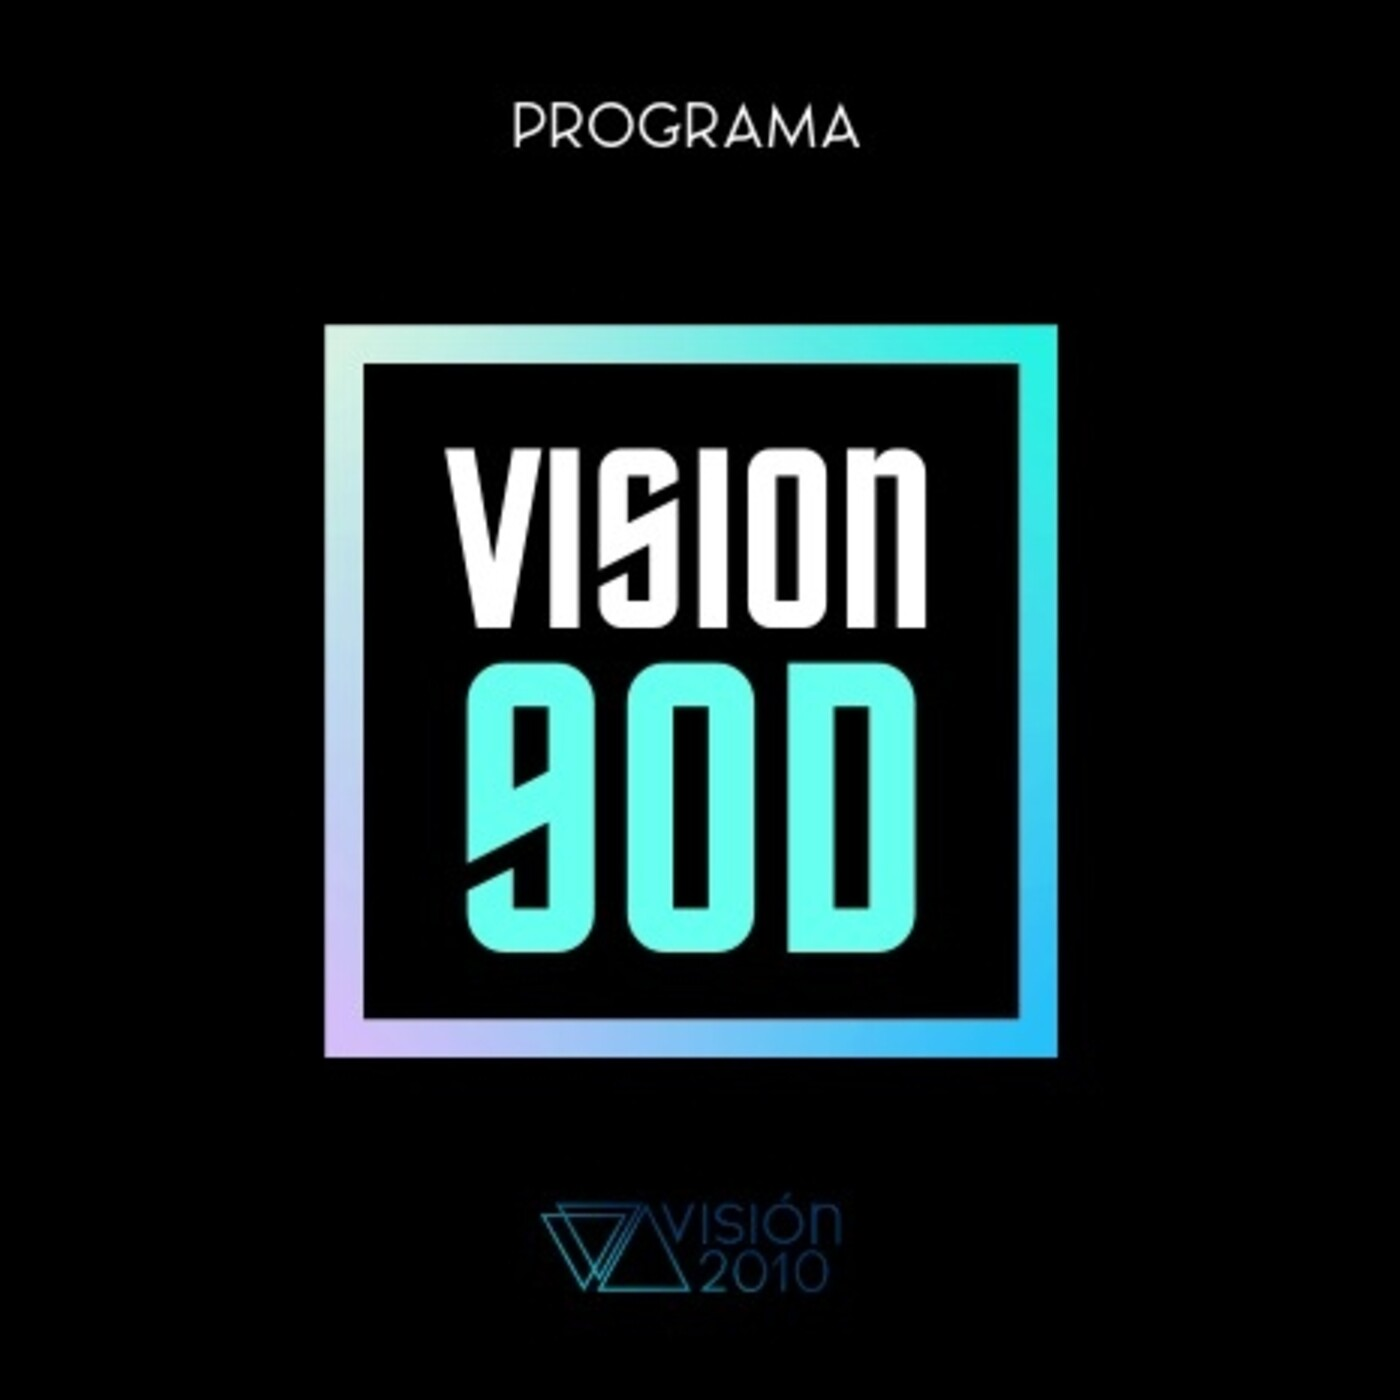 PROGRAMA VISION 90D